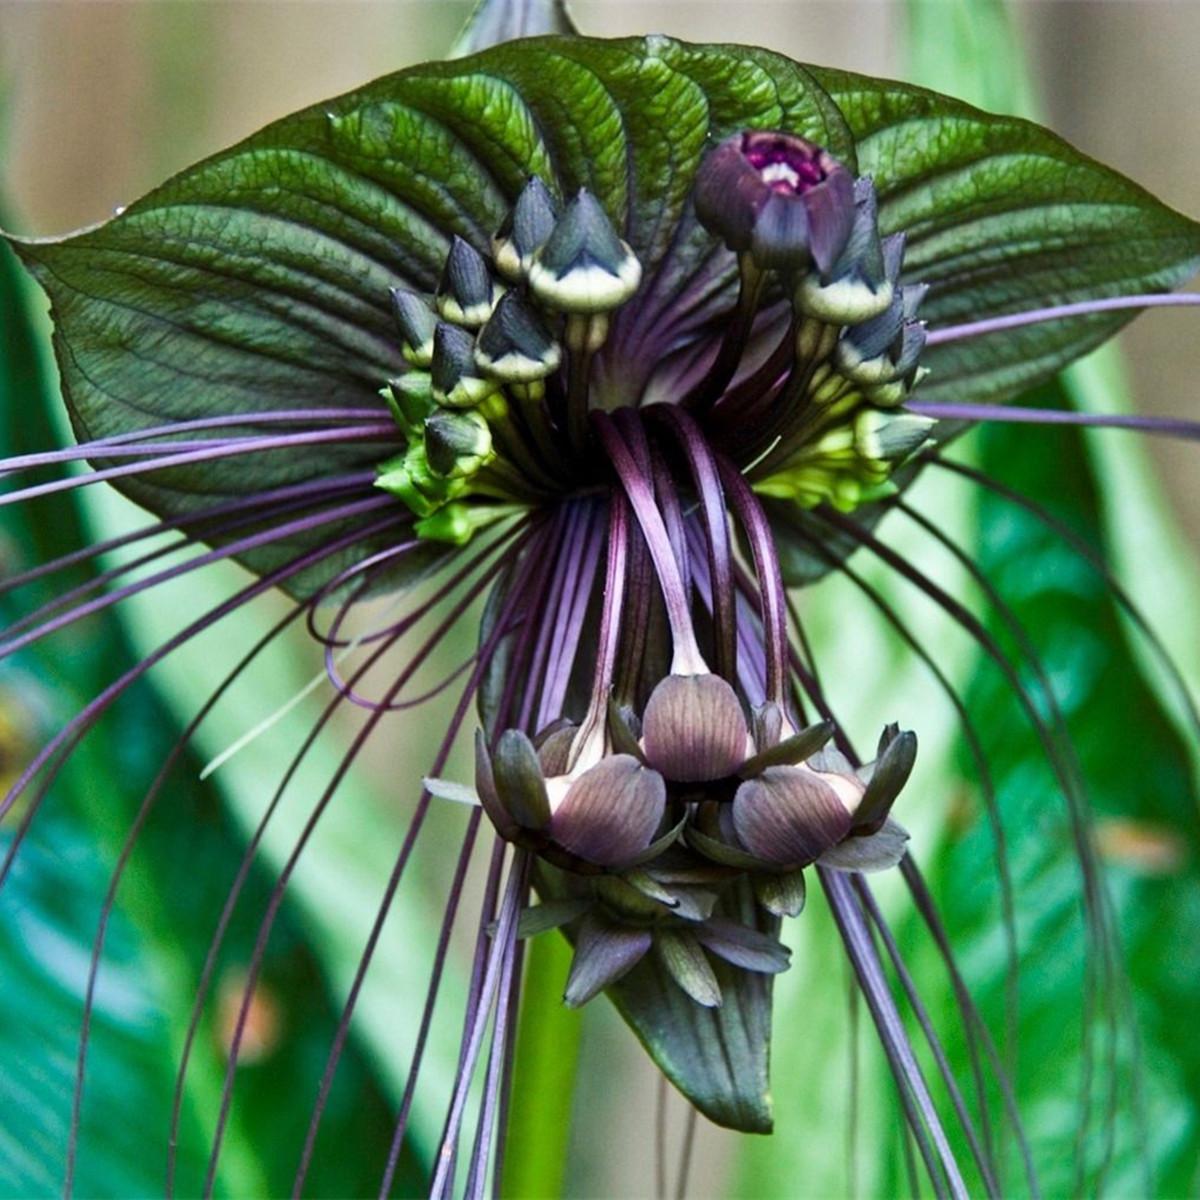 10Pcs Black Bat Tacca Chantrieri Cats Whiskers Flower Seeds Garden Bonsai Plant